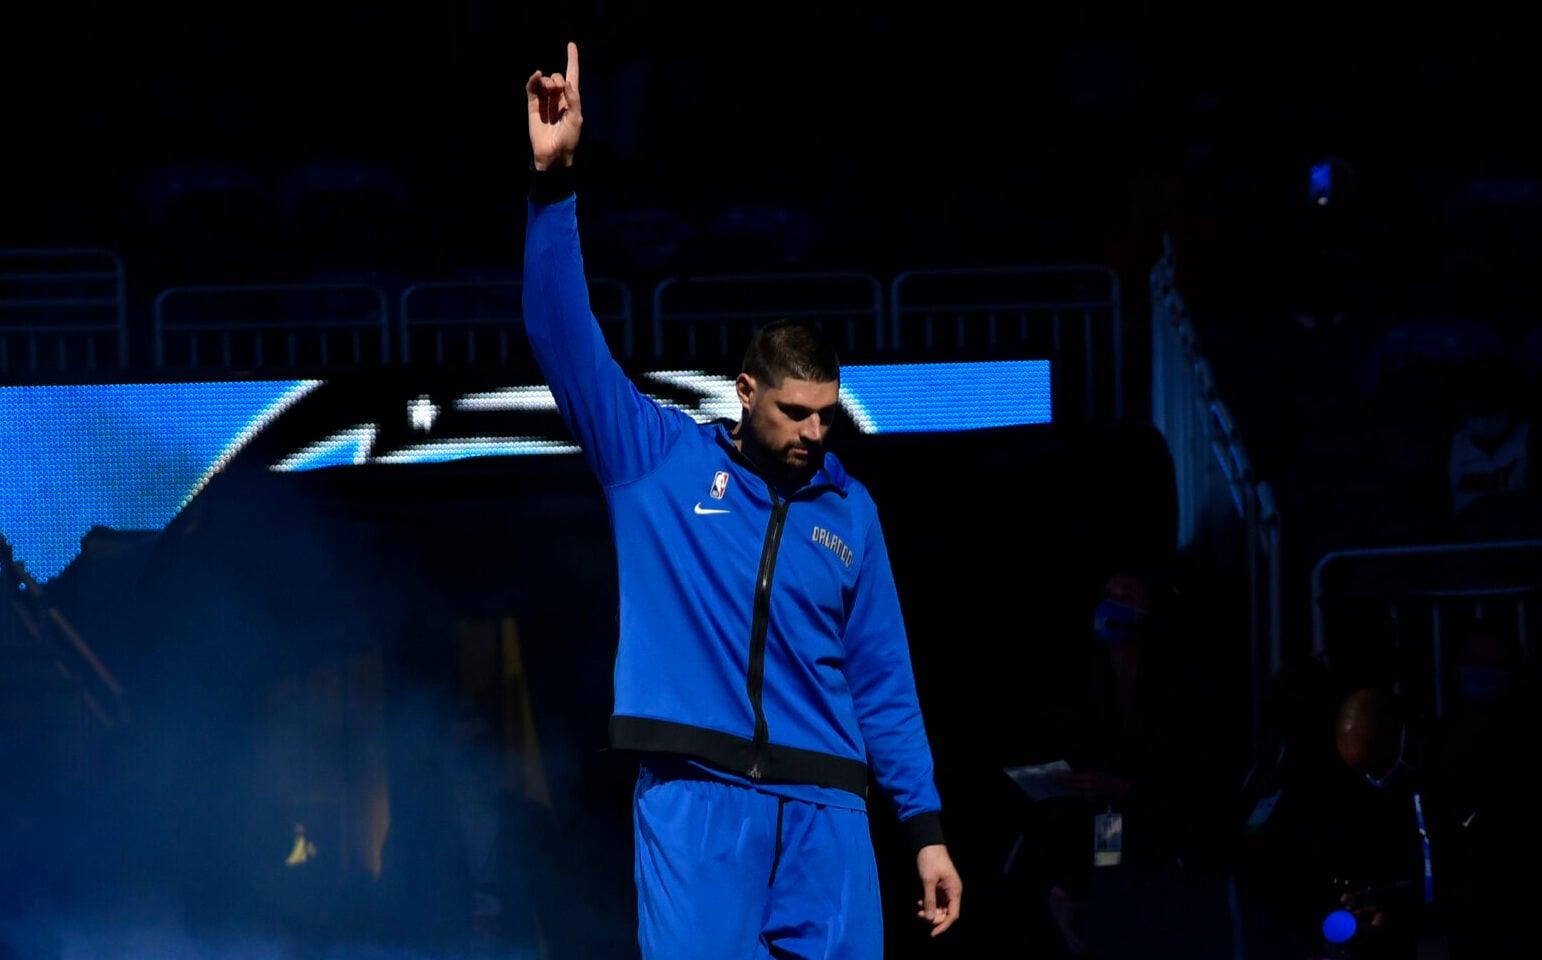 Bulls' Nikola Vucevic fights back tears as he reflects on Magic tenure